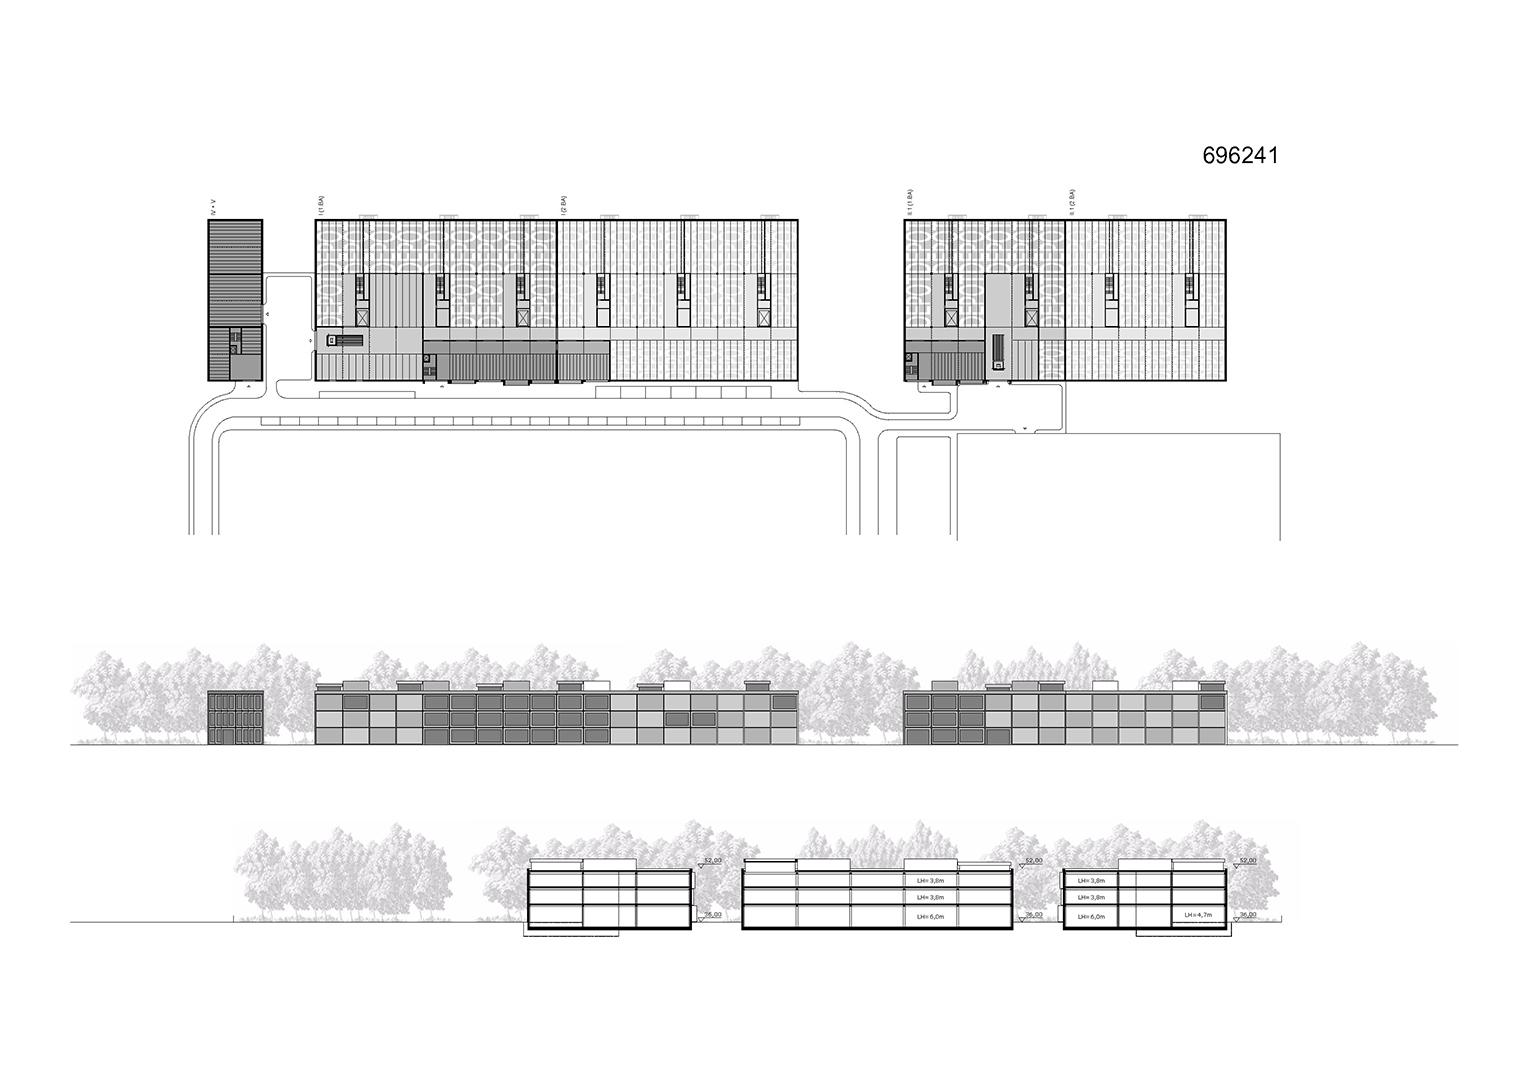 Museumsdepots, Berlin | Sauerzapfe Architekten